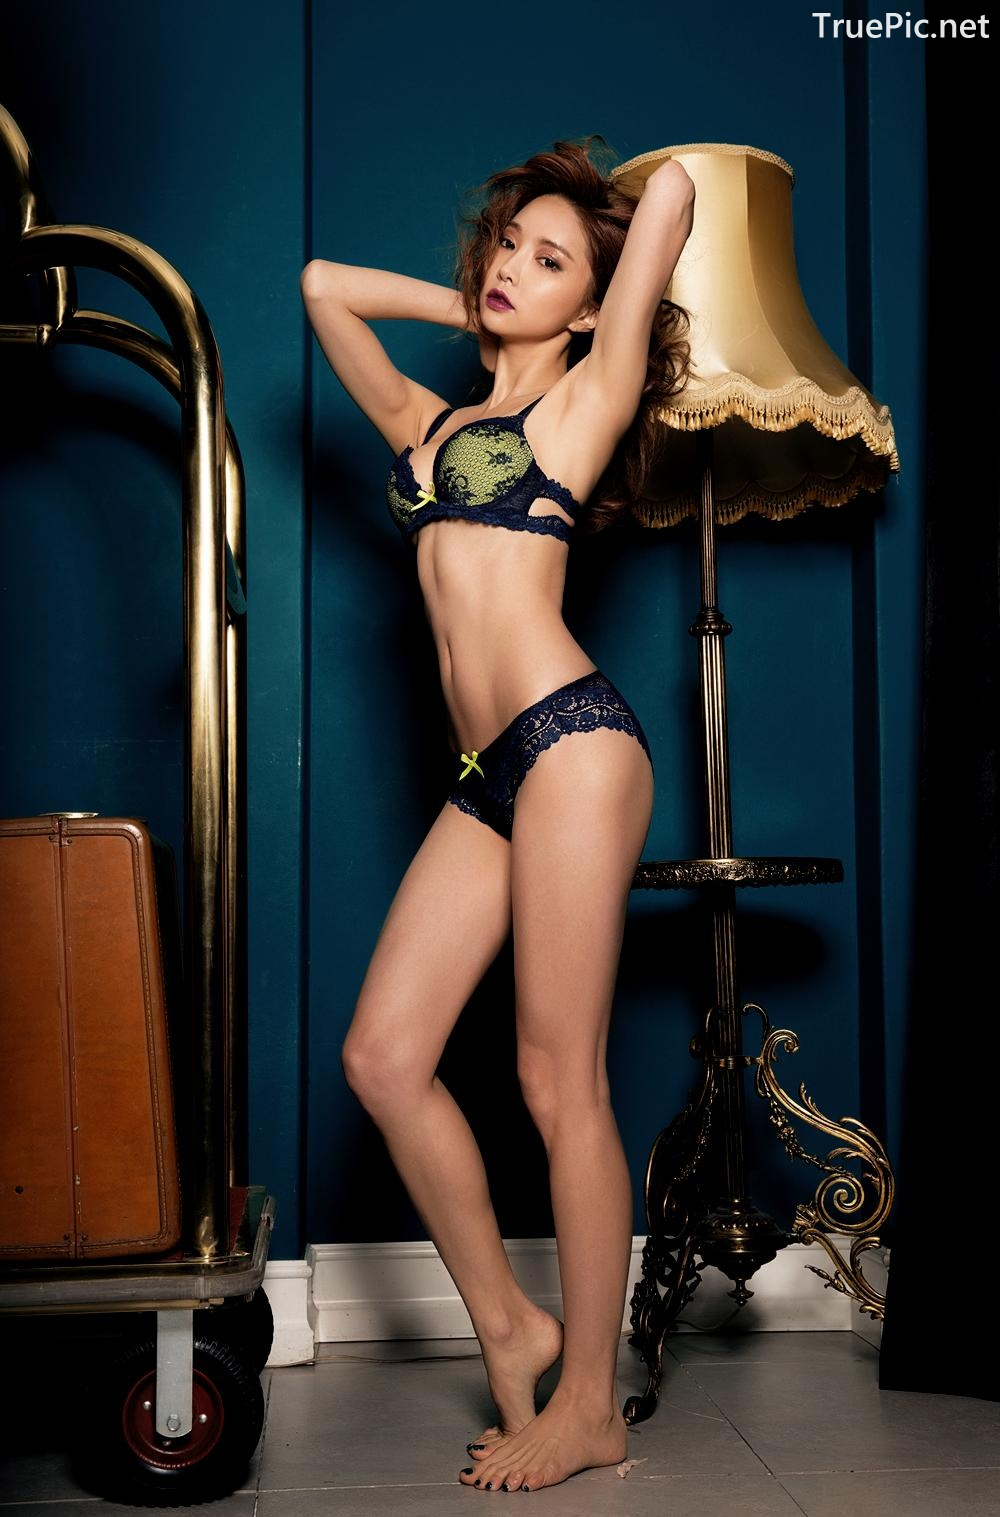 Image Korean Fashion Model - Park Soo Yeon - BVB Black Lace Lingerie - TruePic.net - Picture-8